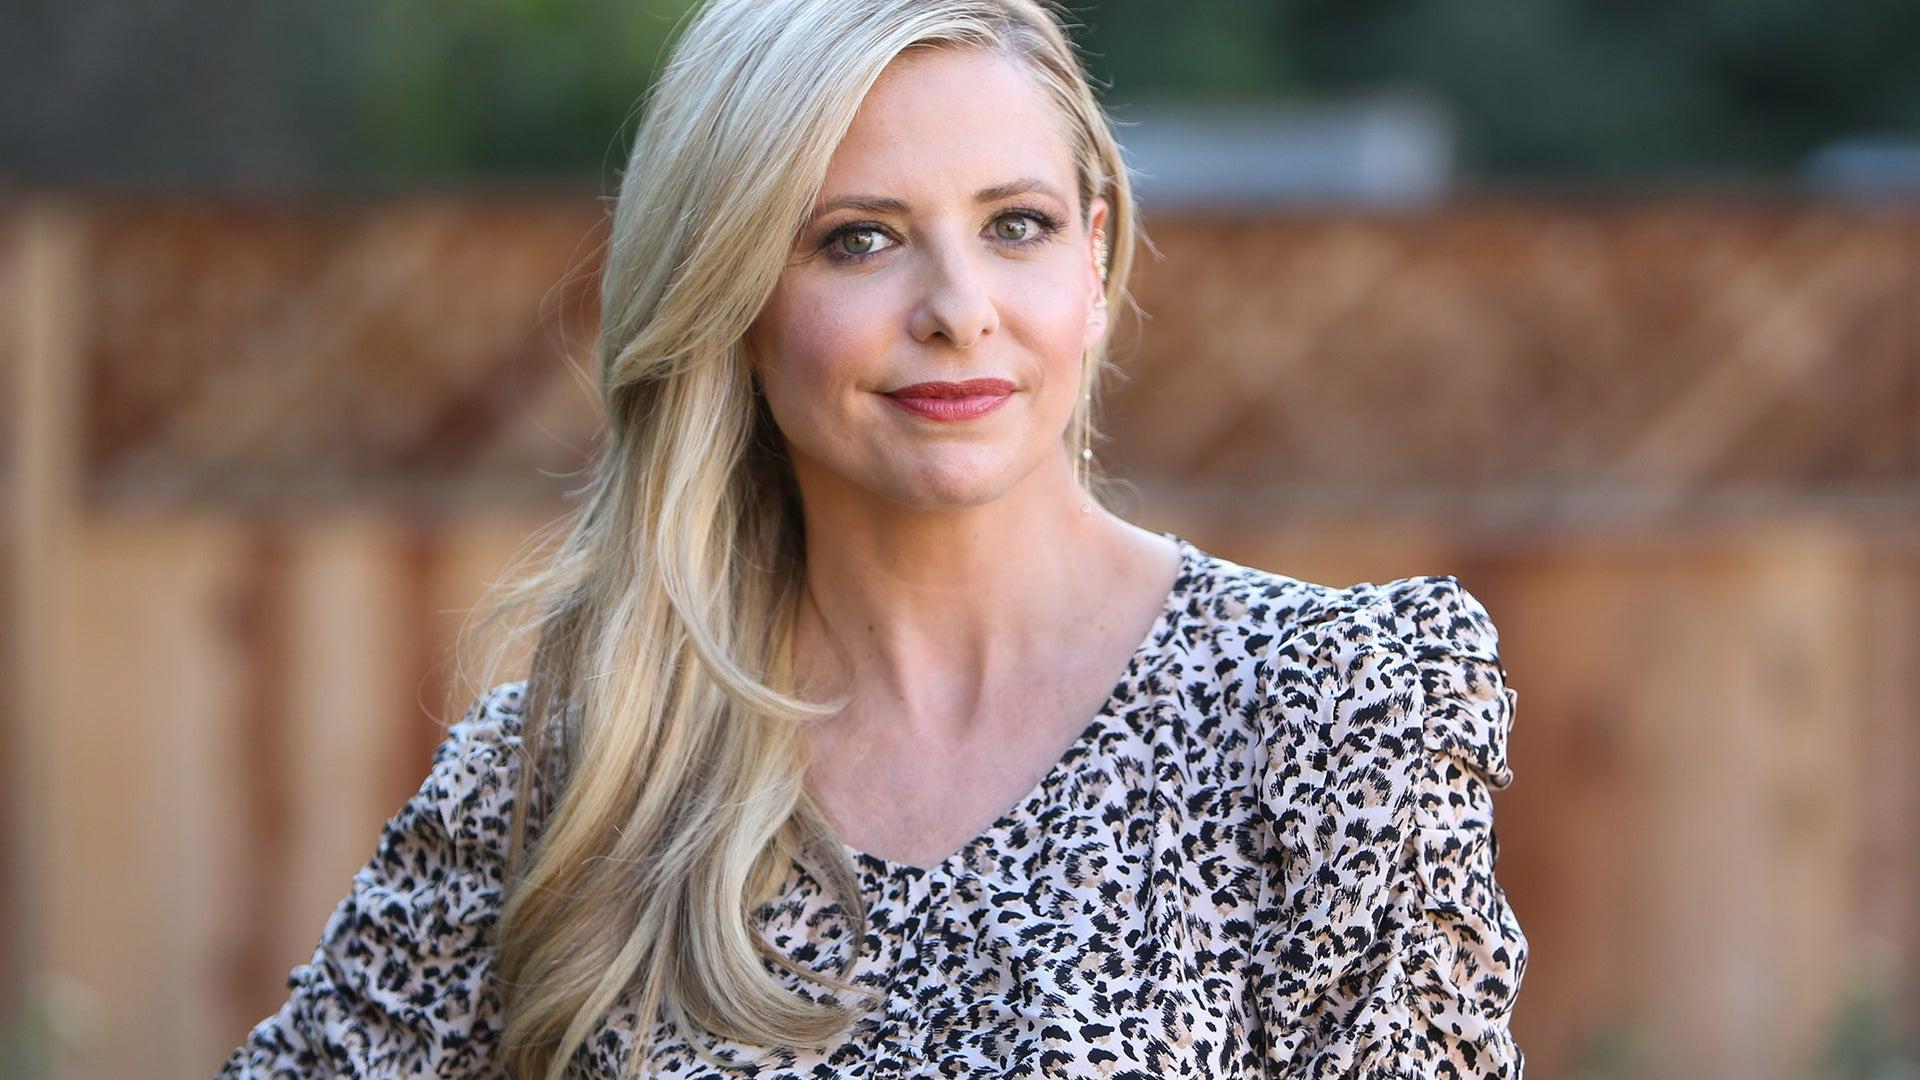 Sarah Michelle Geller, Hallmark's Home & Family